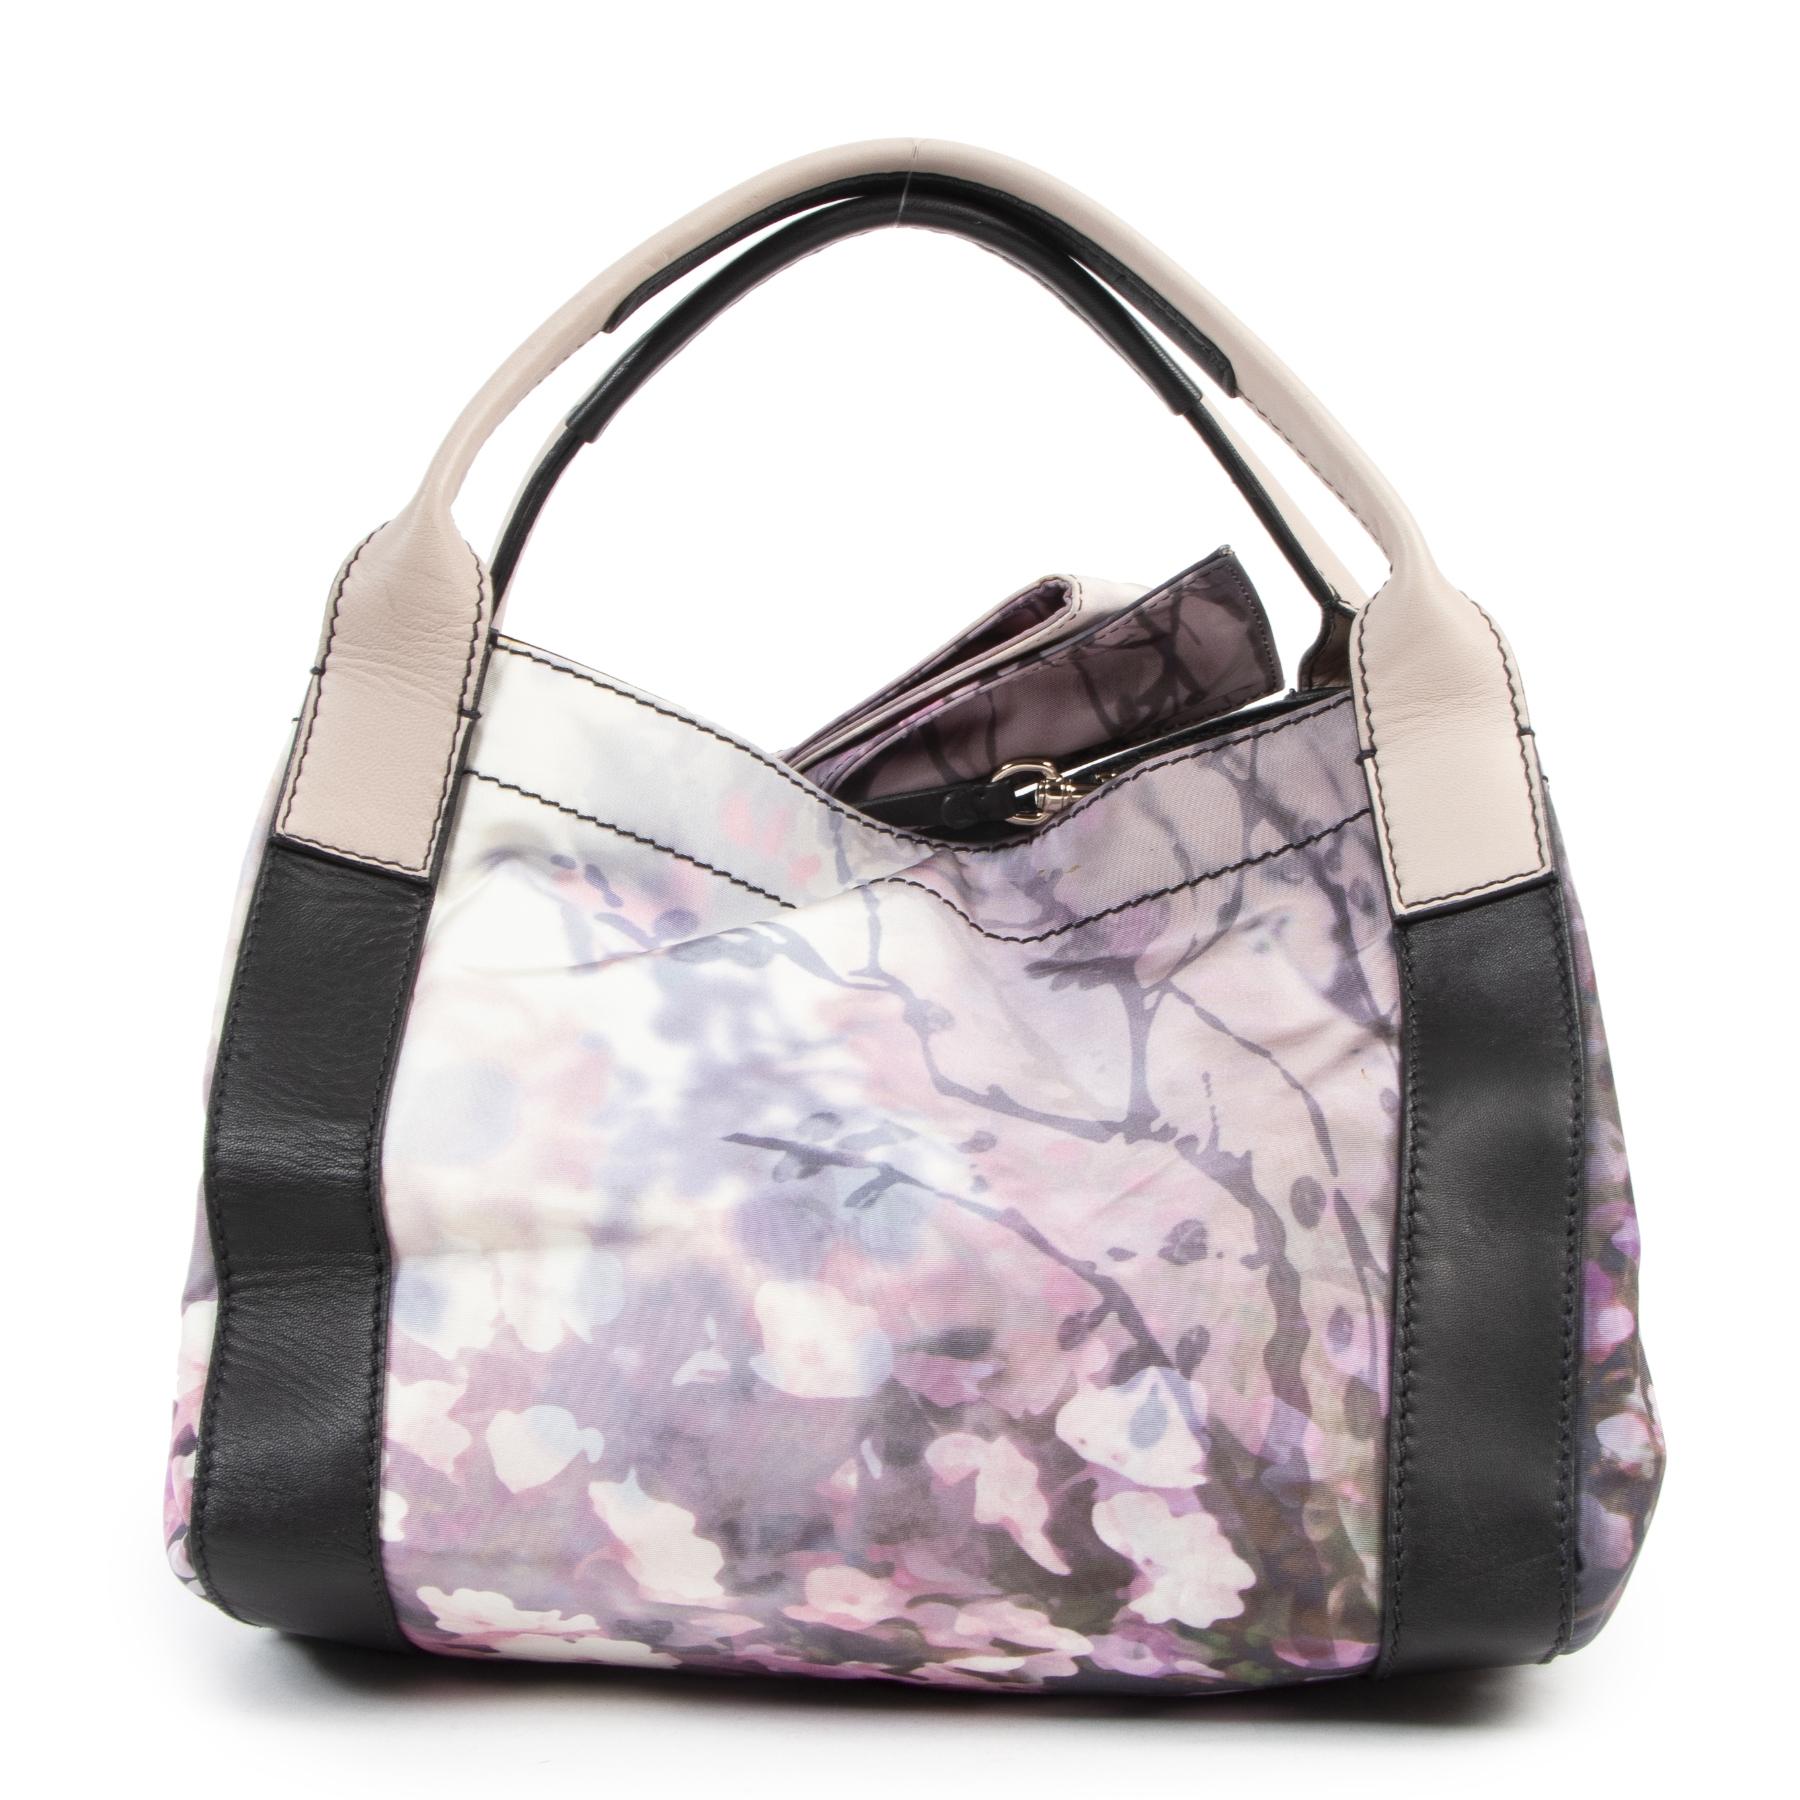 Valentino Floral Printed Tessuto Medium Nylon Tote